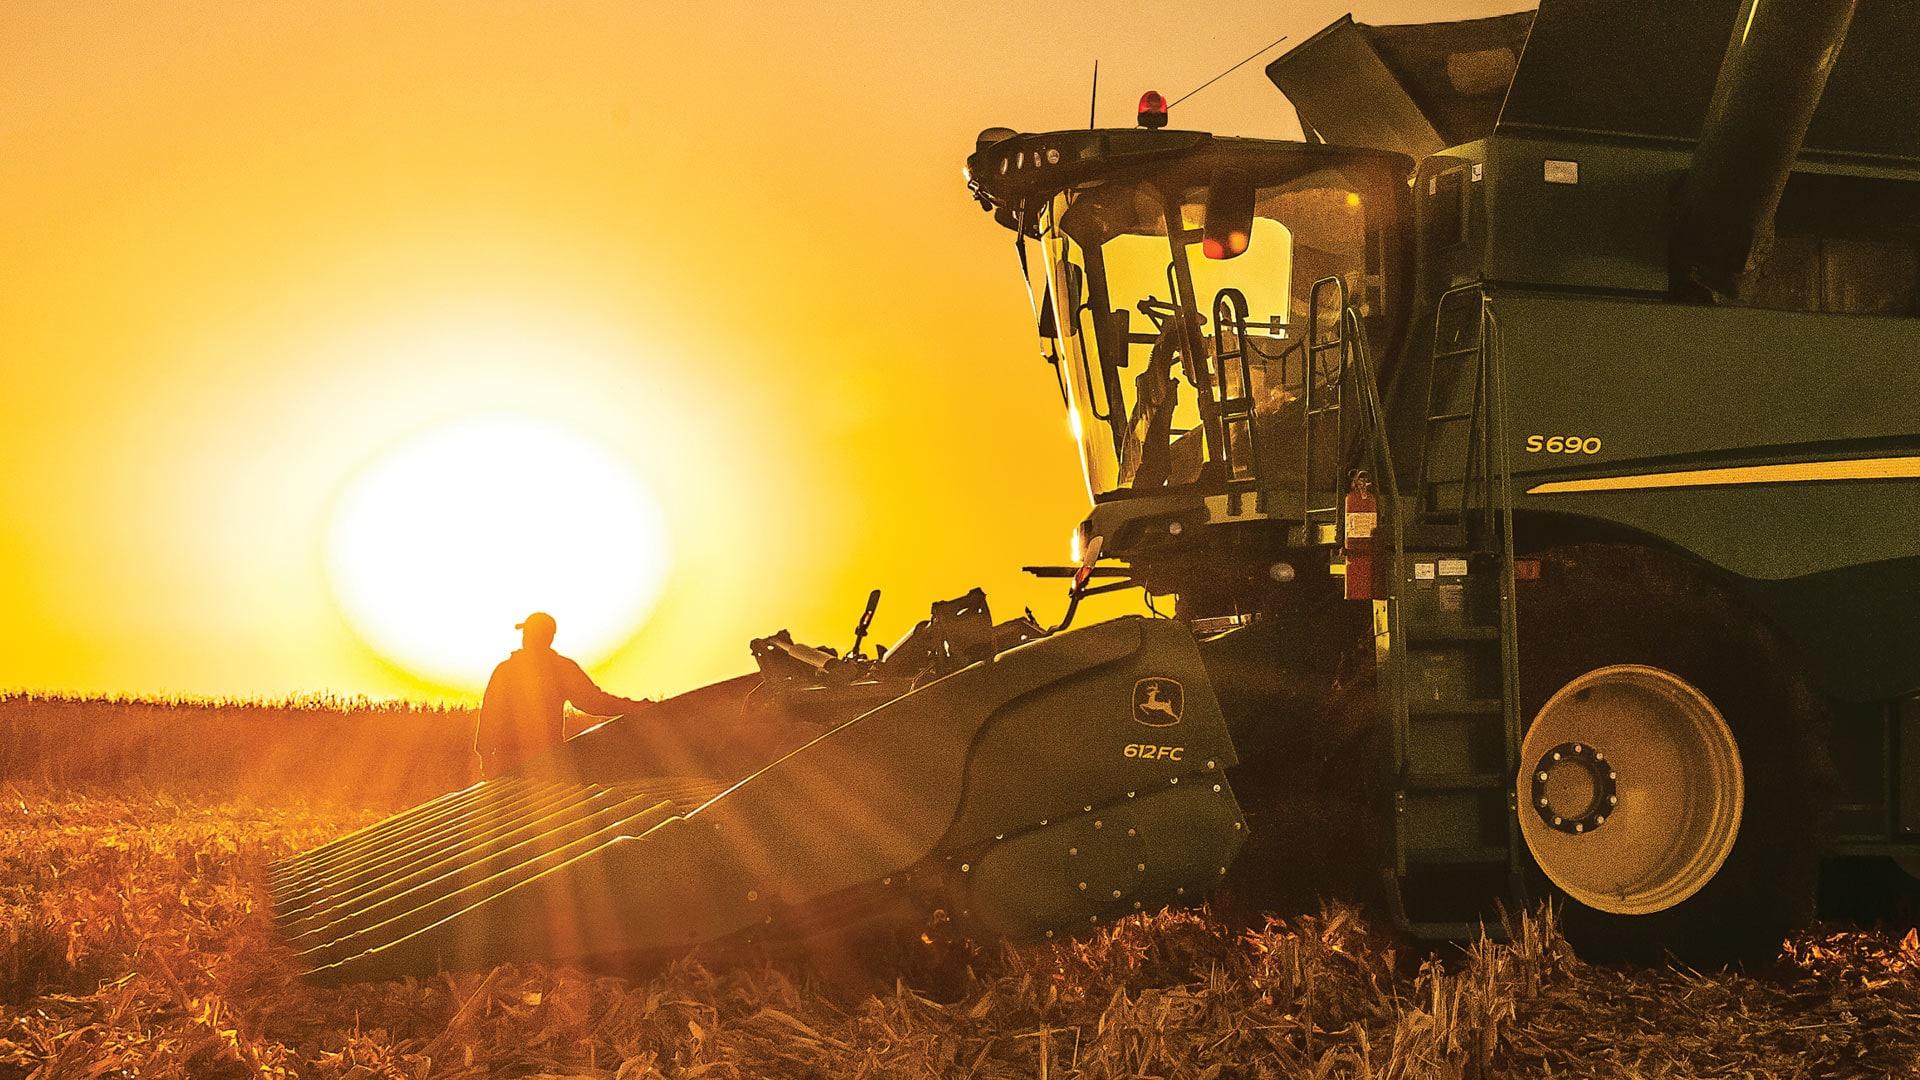 Man operating a John Deere corn head harvester at sunset.